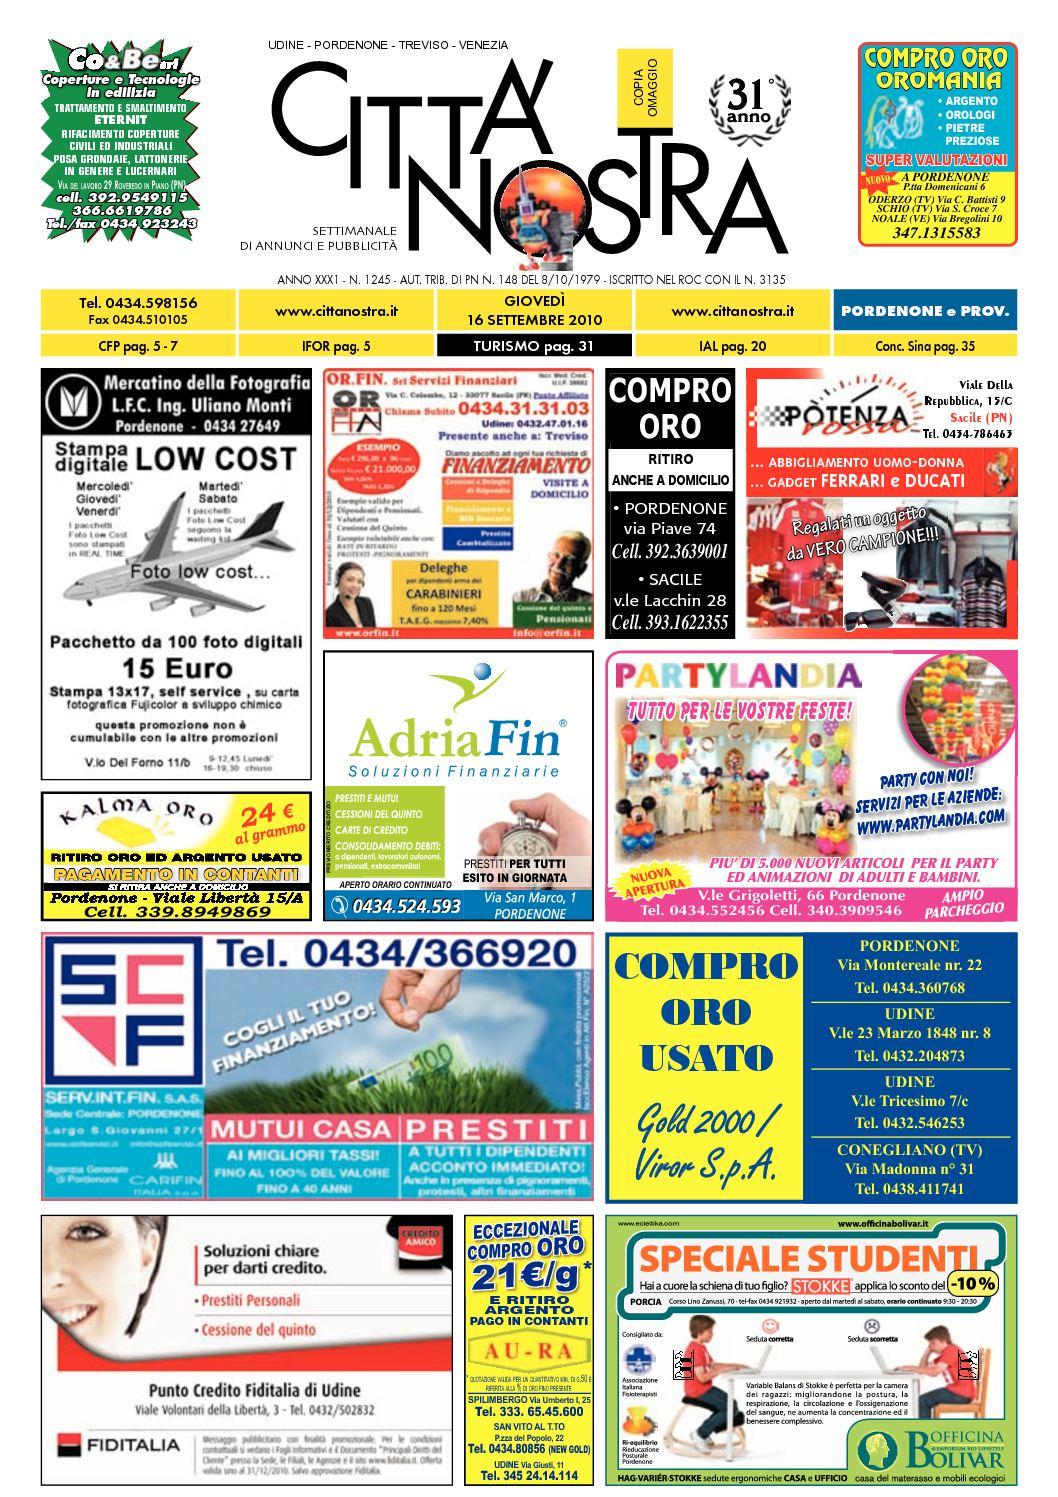 16 2010 Nostra Pordenone Del Calamᄄᆭo 09 N1245 Cittᄄᄂ N0m8nw